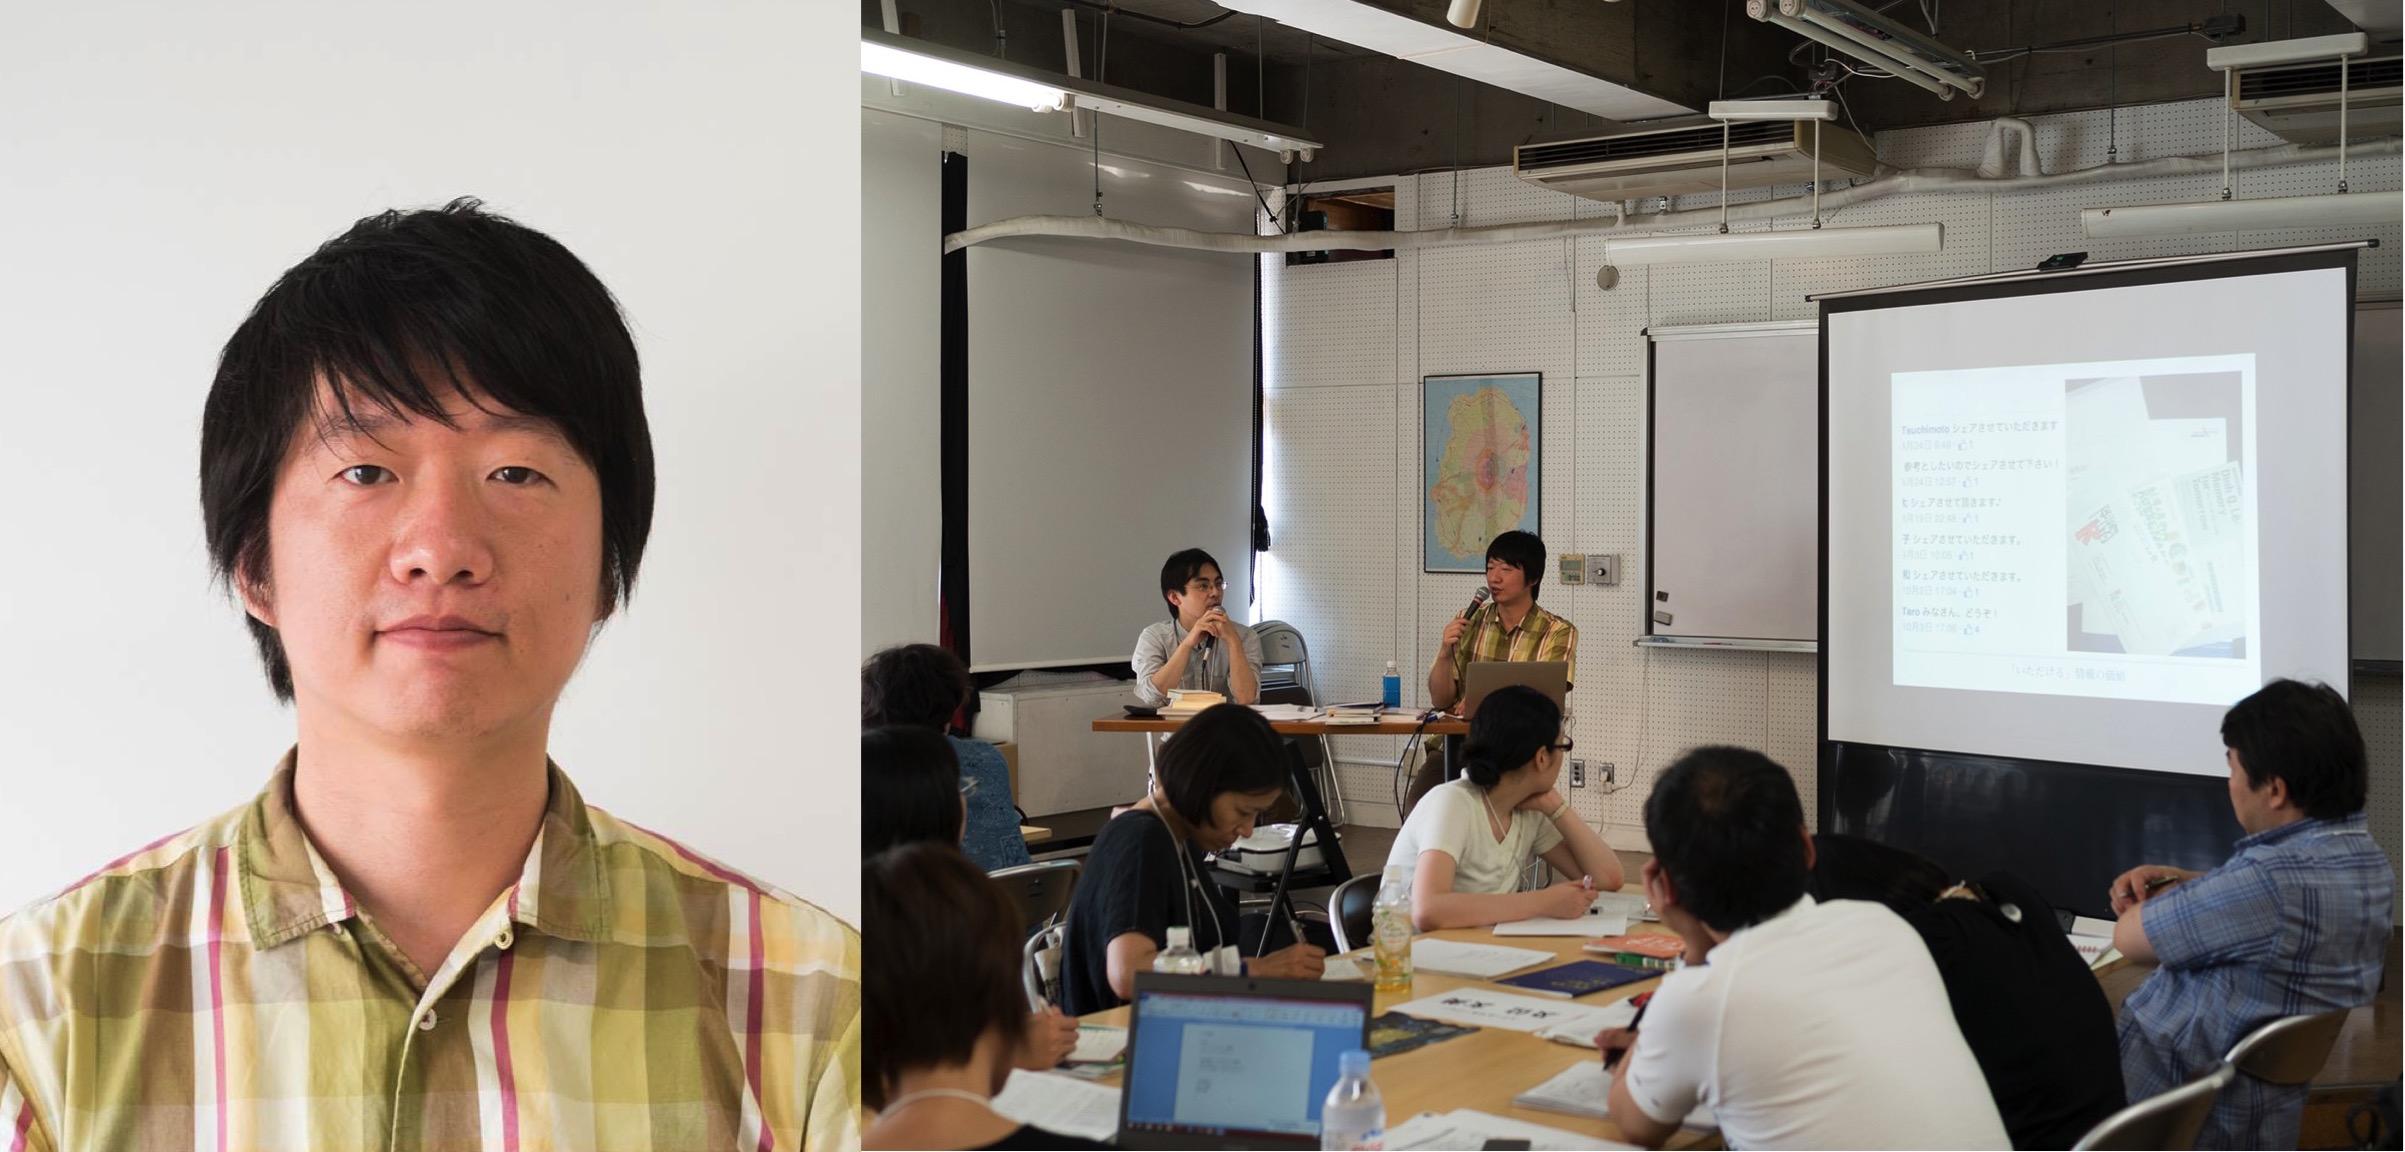 KCIC アートマネジメント ラボ「価値を伝えるプロジェクト記録術」講師:橋本 誠(アートプロデューサー/一般社団法人ノマドプロダクション 代表理事)